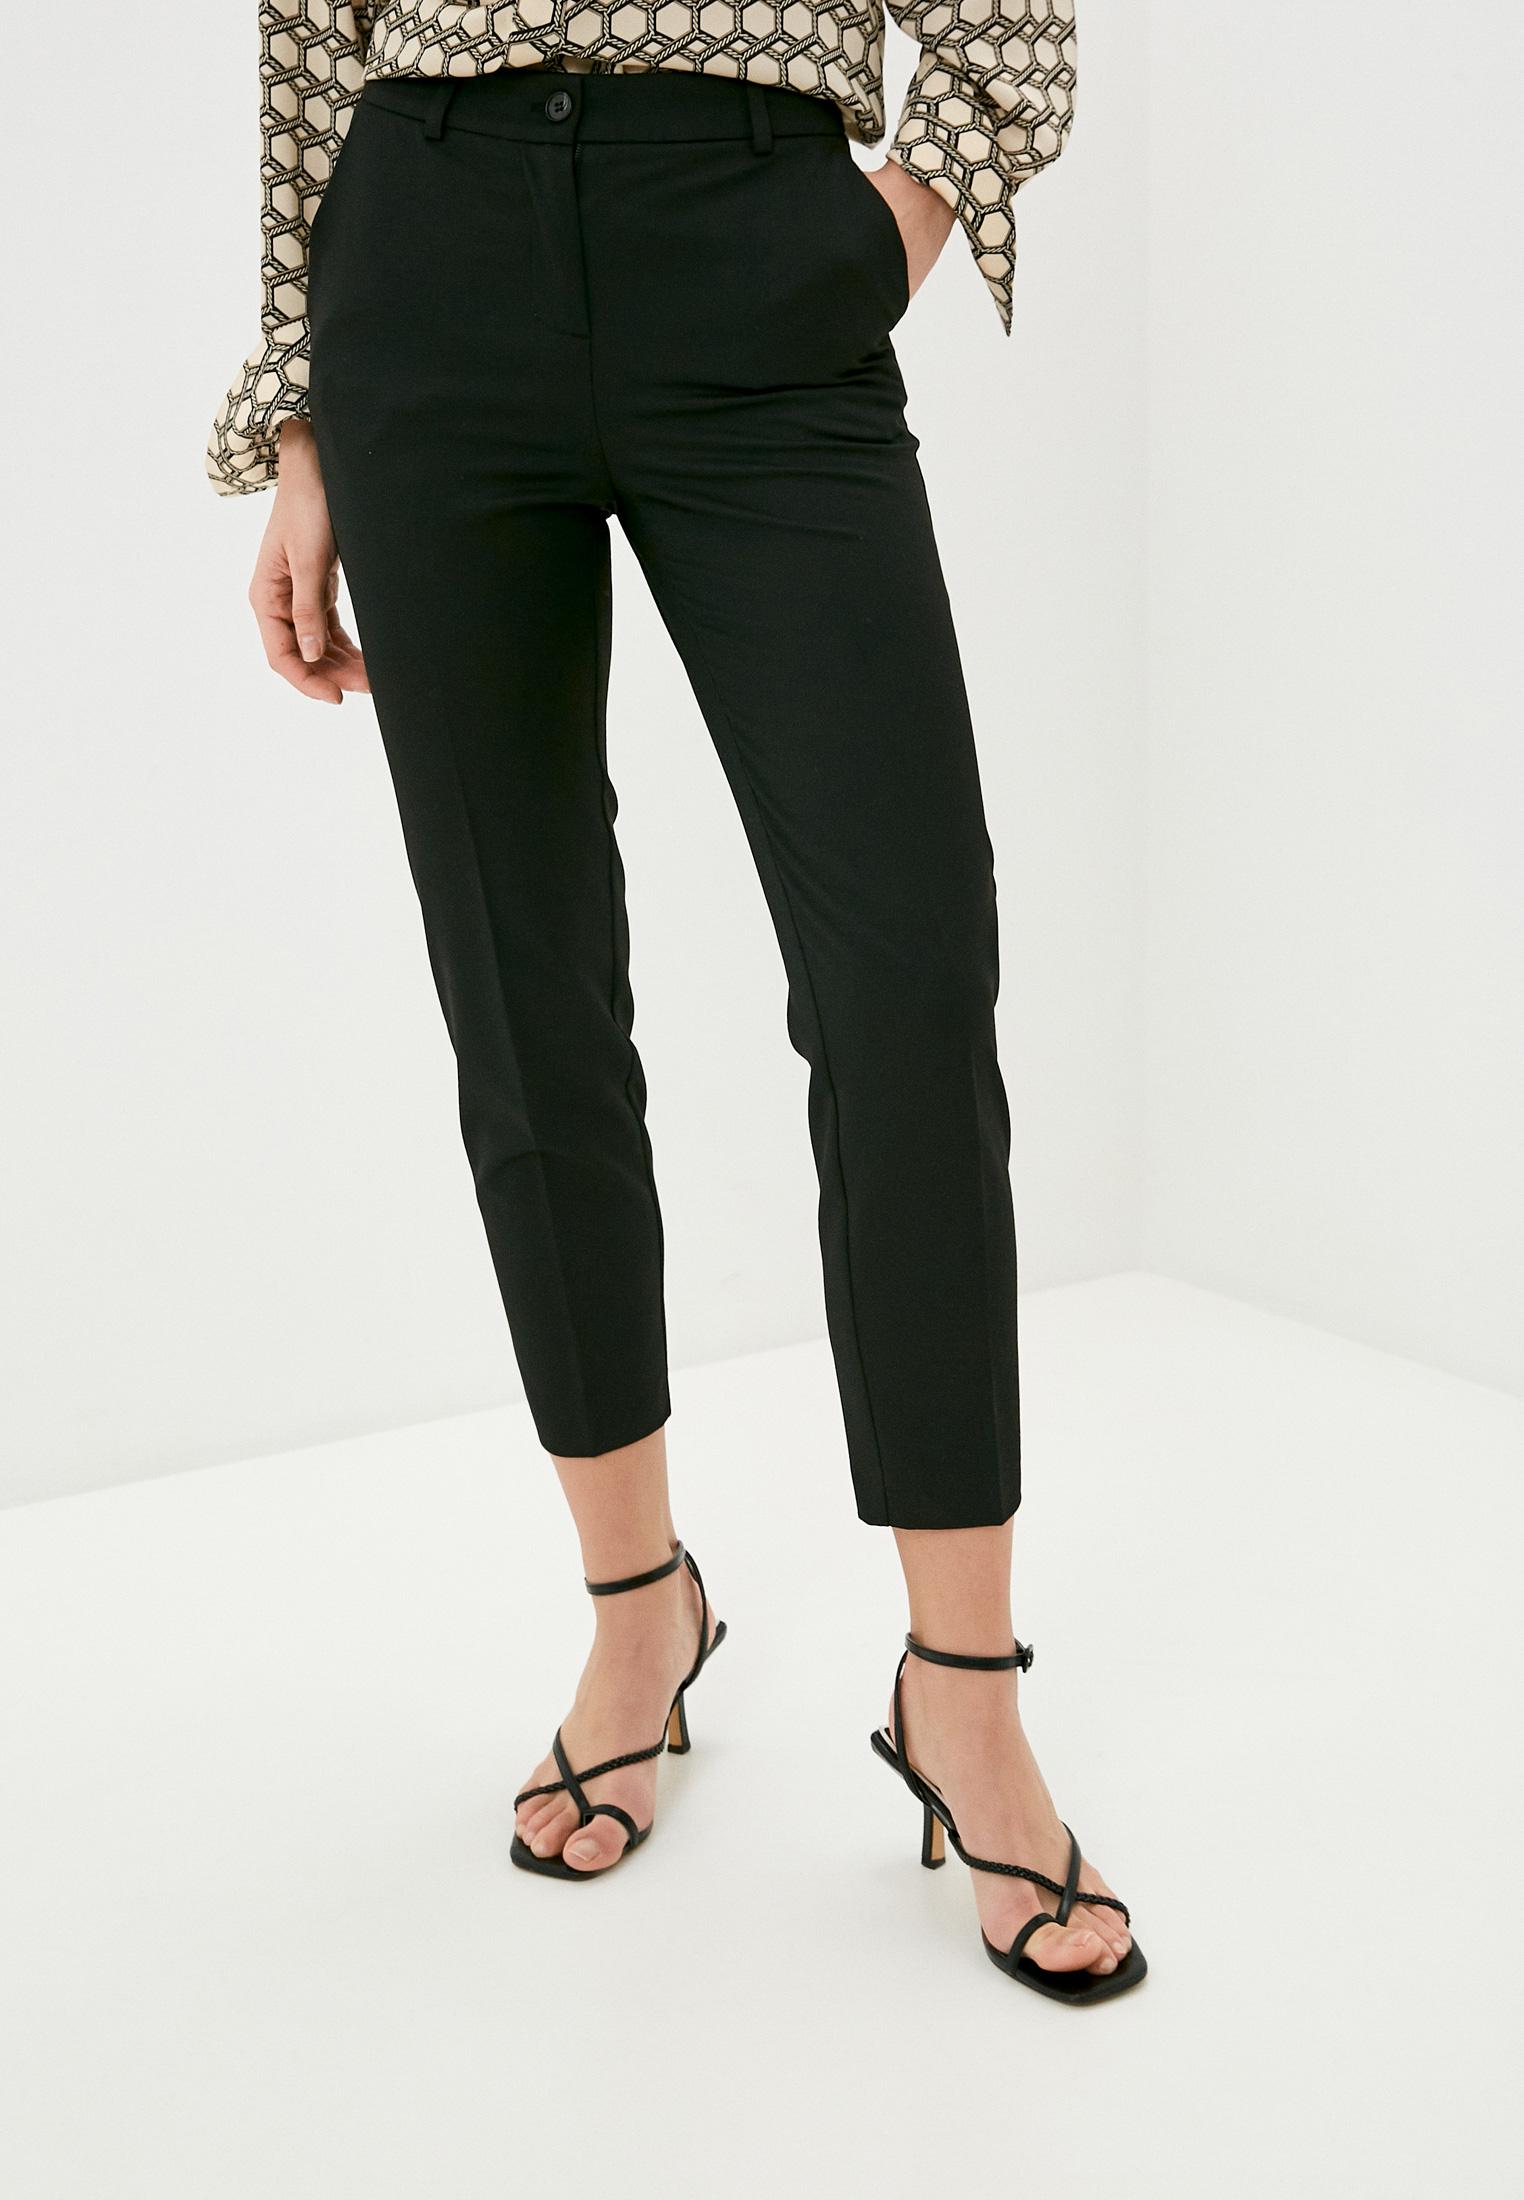 Женские классические брюки SHARTREZ 608-БР2